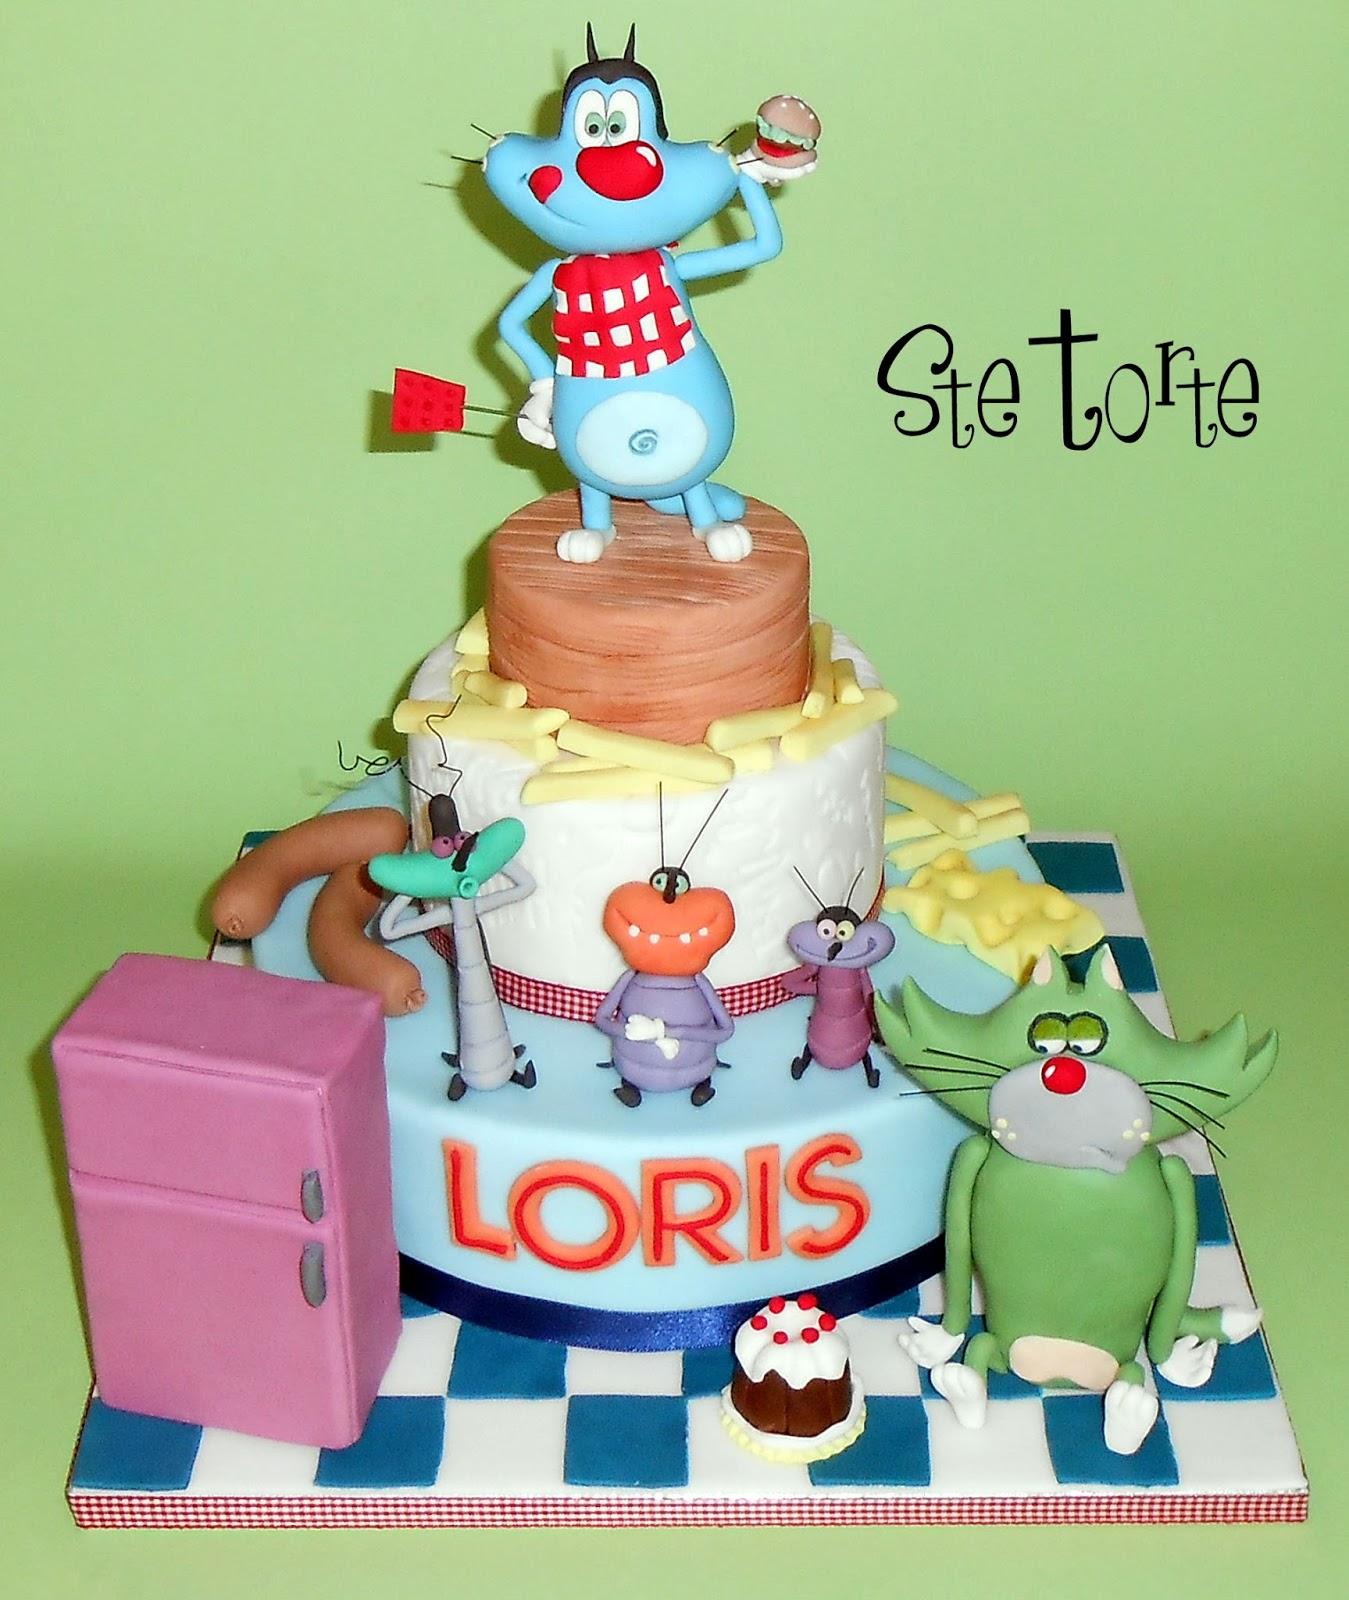 Famoso Ste torte: Torta Oggy e i maledetti scarafaggi RC25